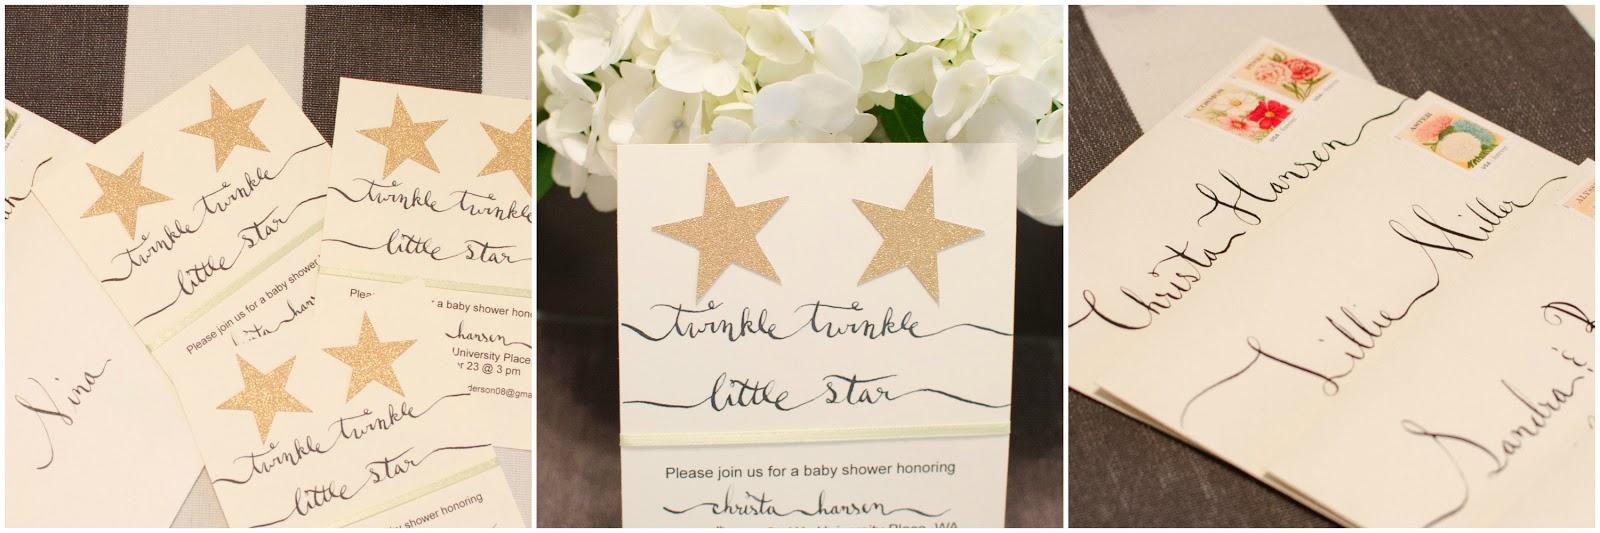 these little loves: Twinkle Twinkle Little Star | A Tale of Two Baby ...